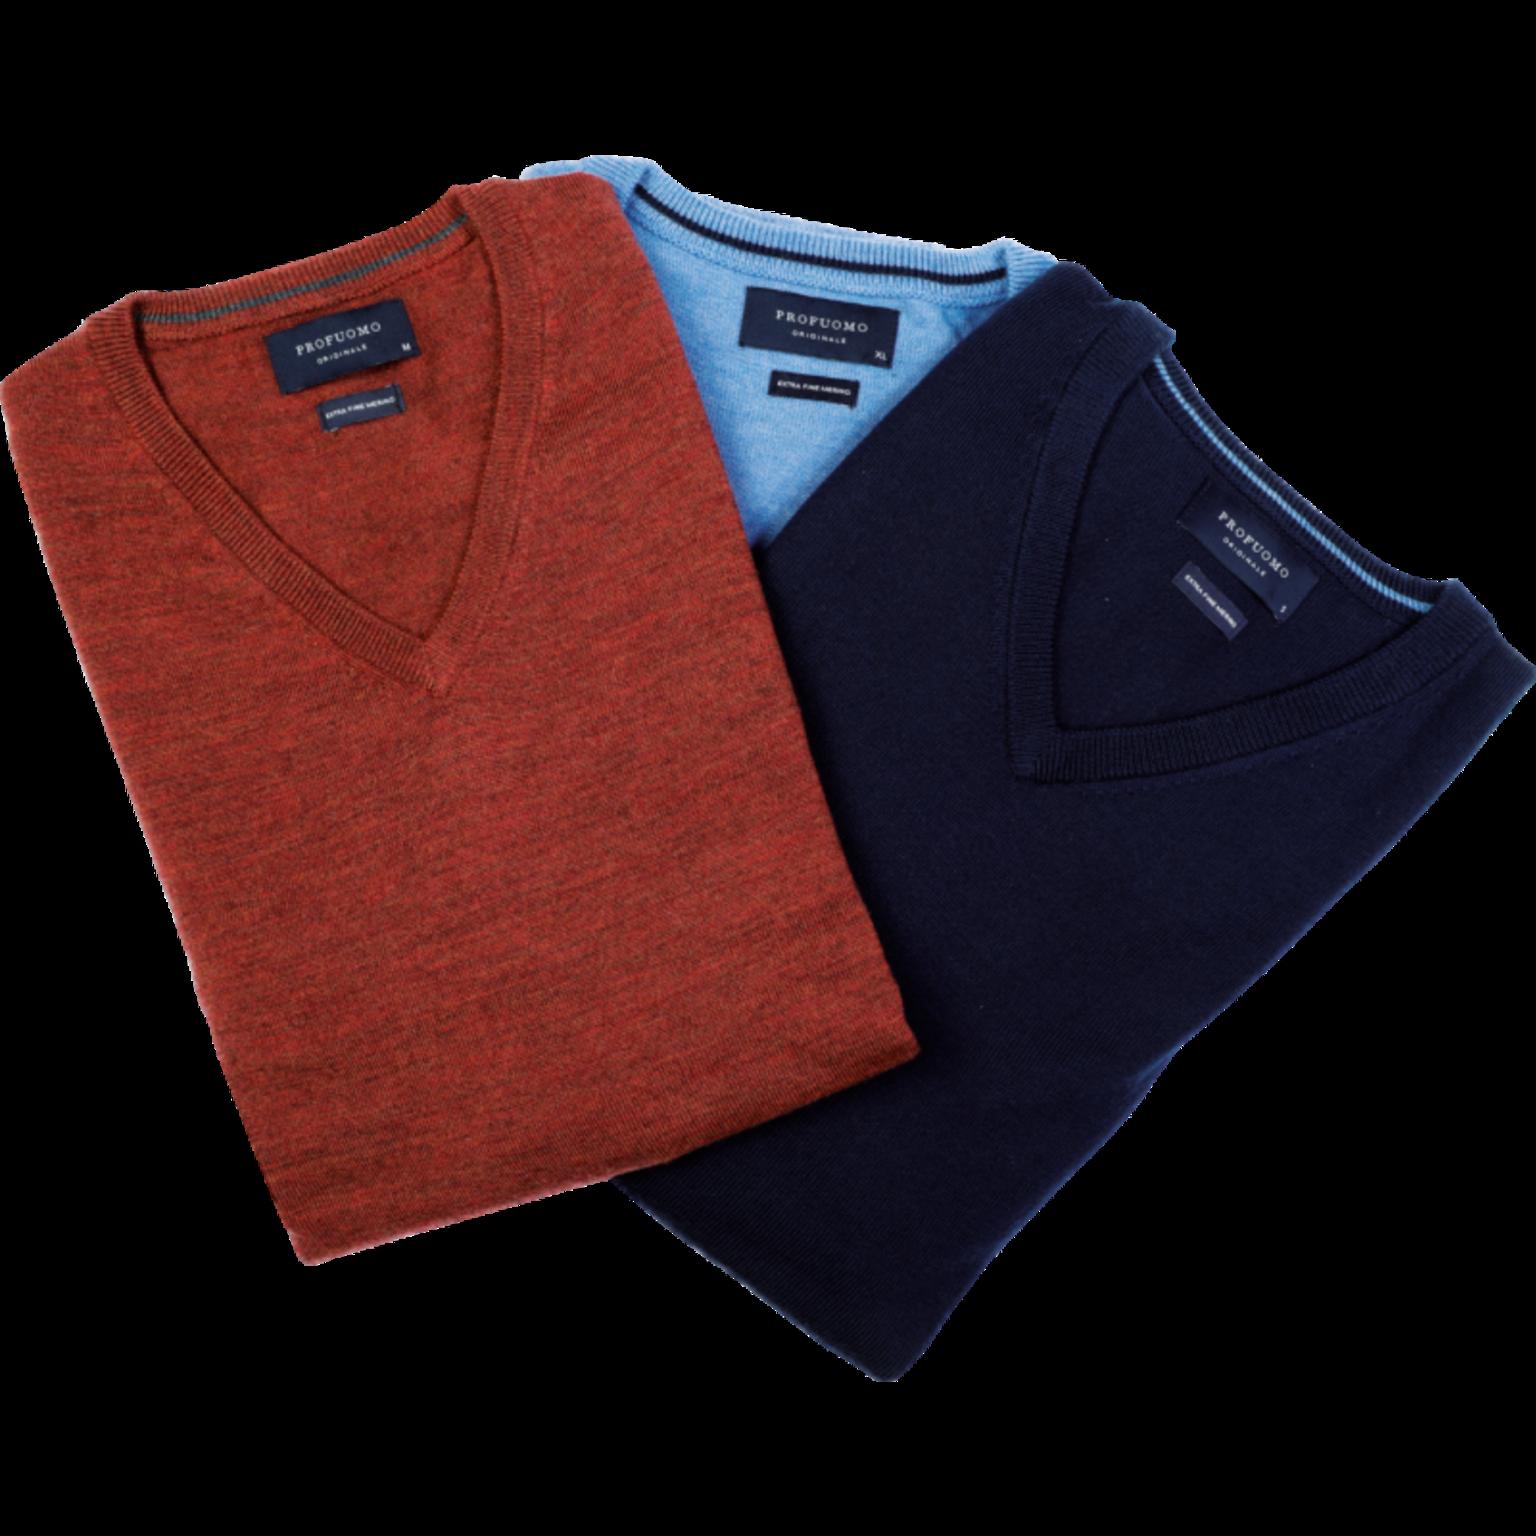 Men's pullover or shirt